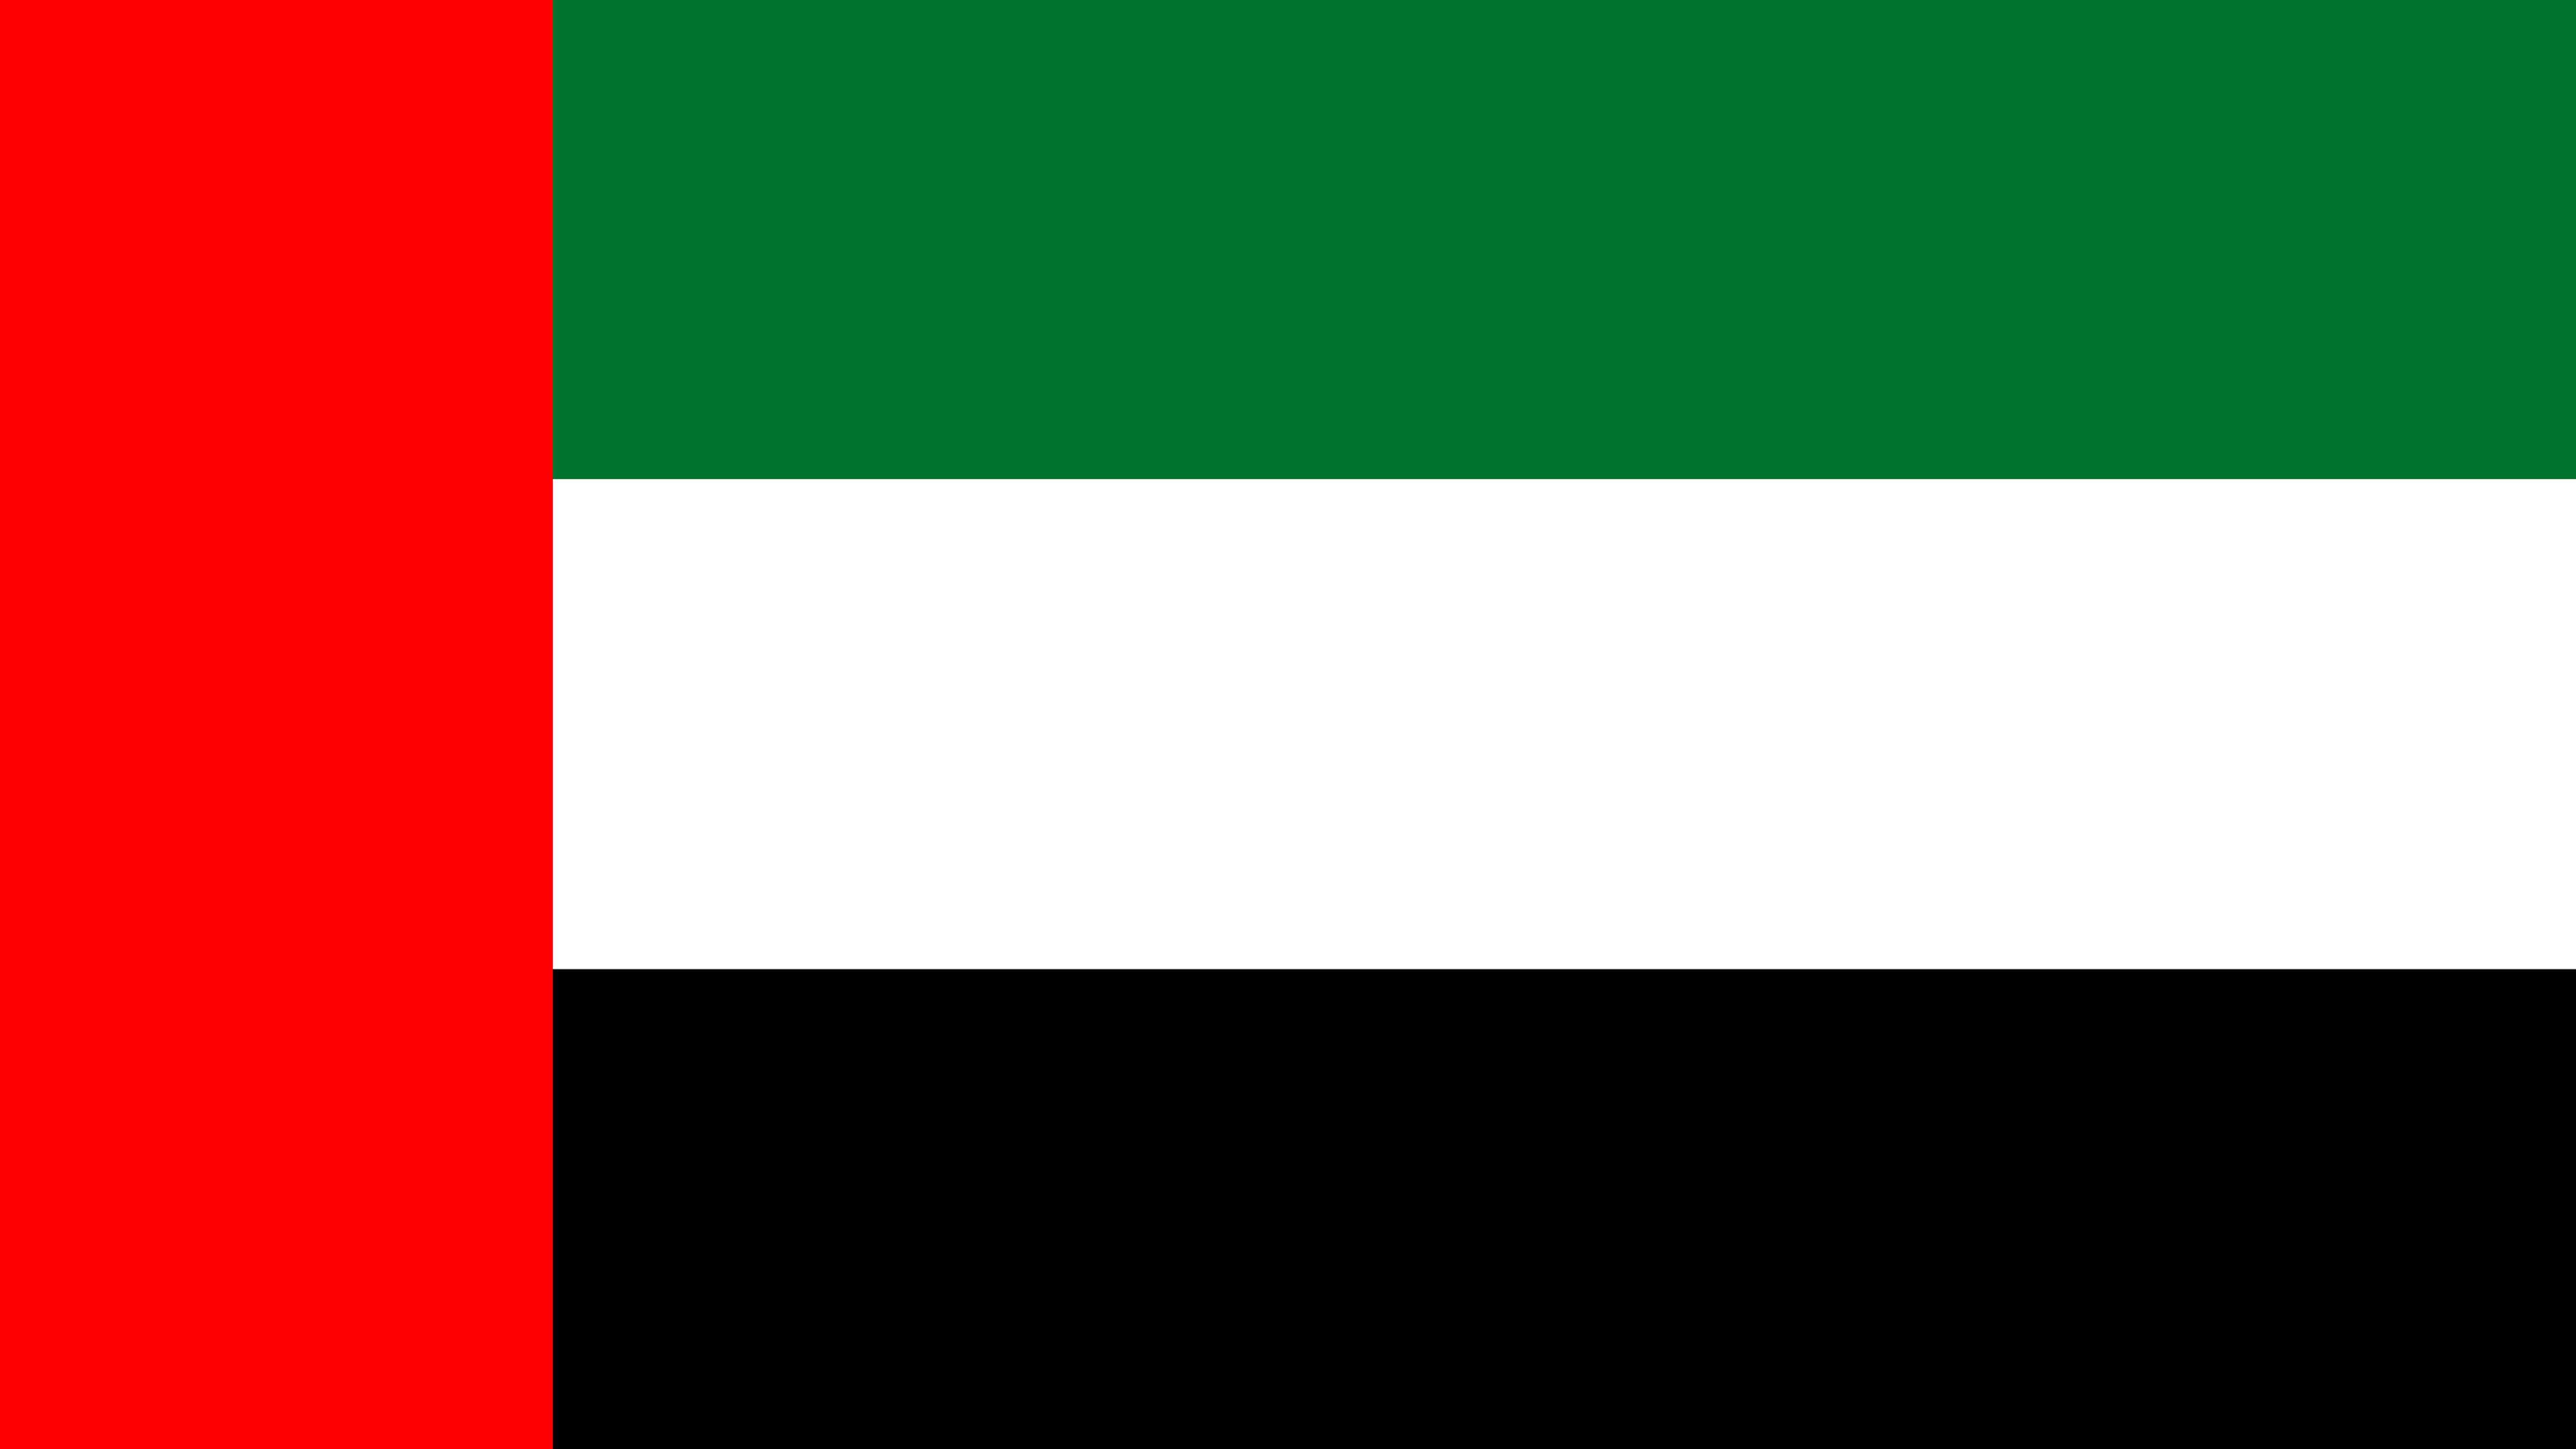 United Arab Emirates Flag UHD 4K Wallpaper Pixelz 3840x2160